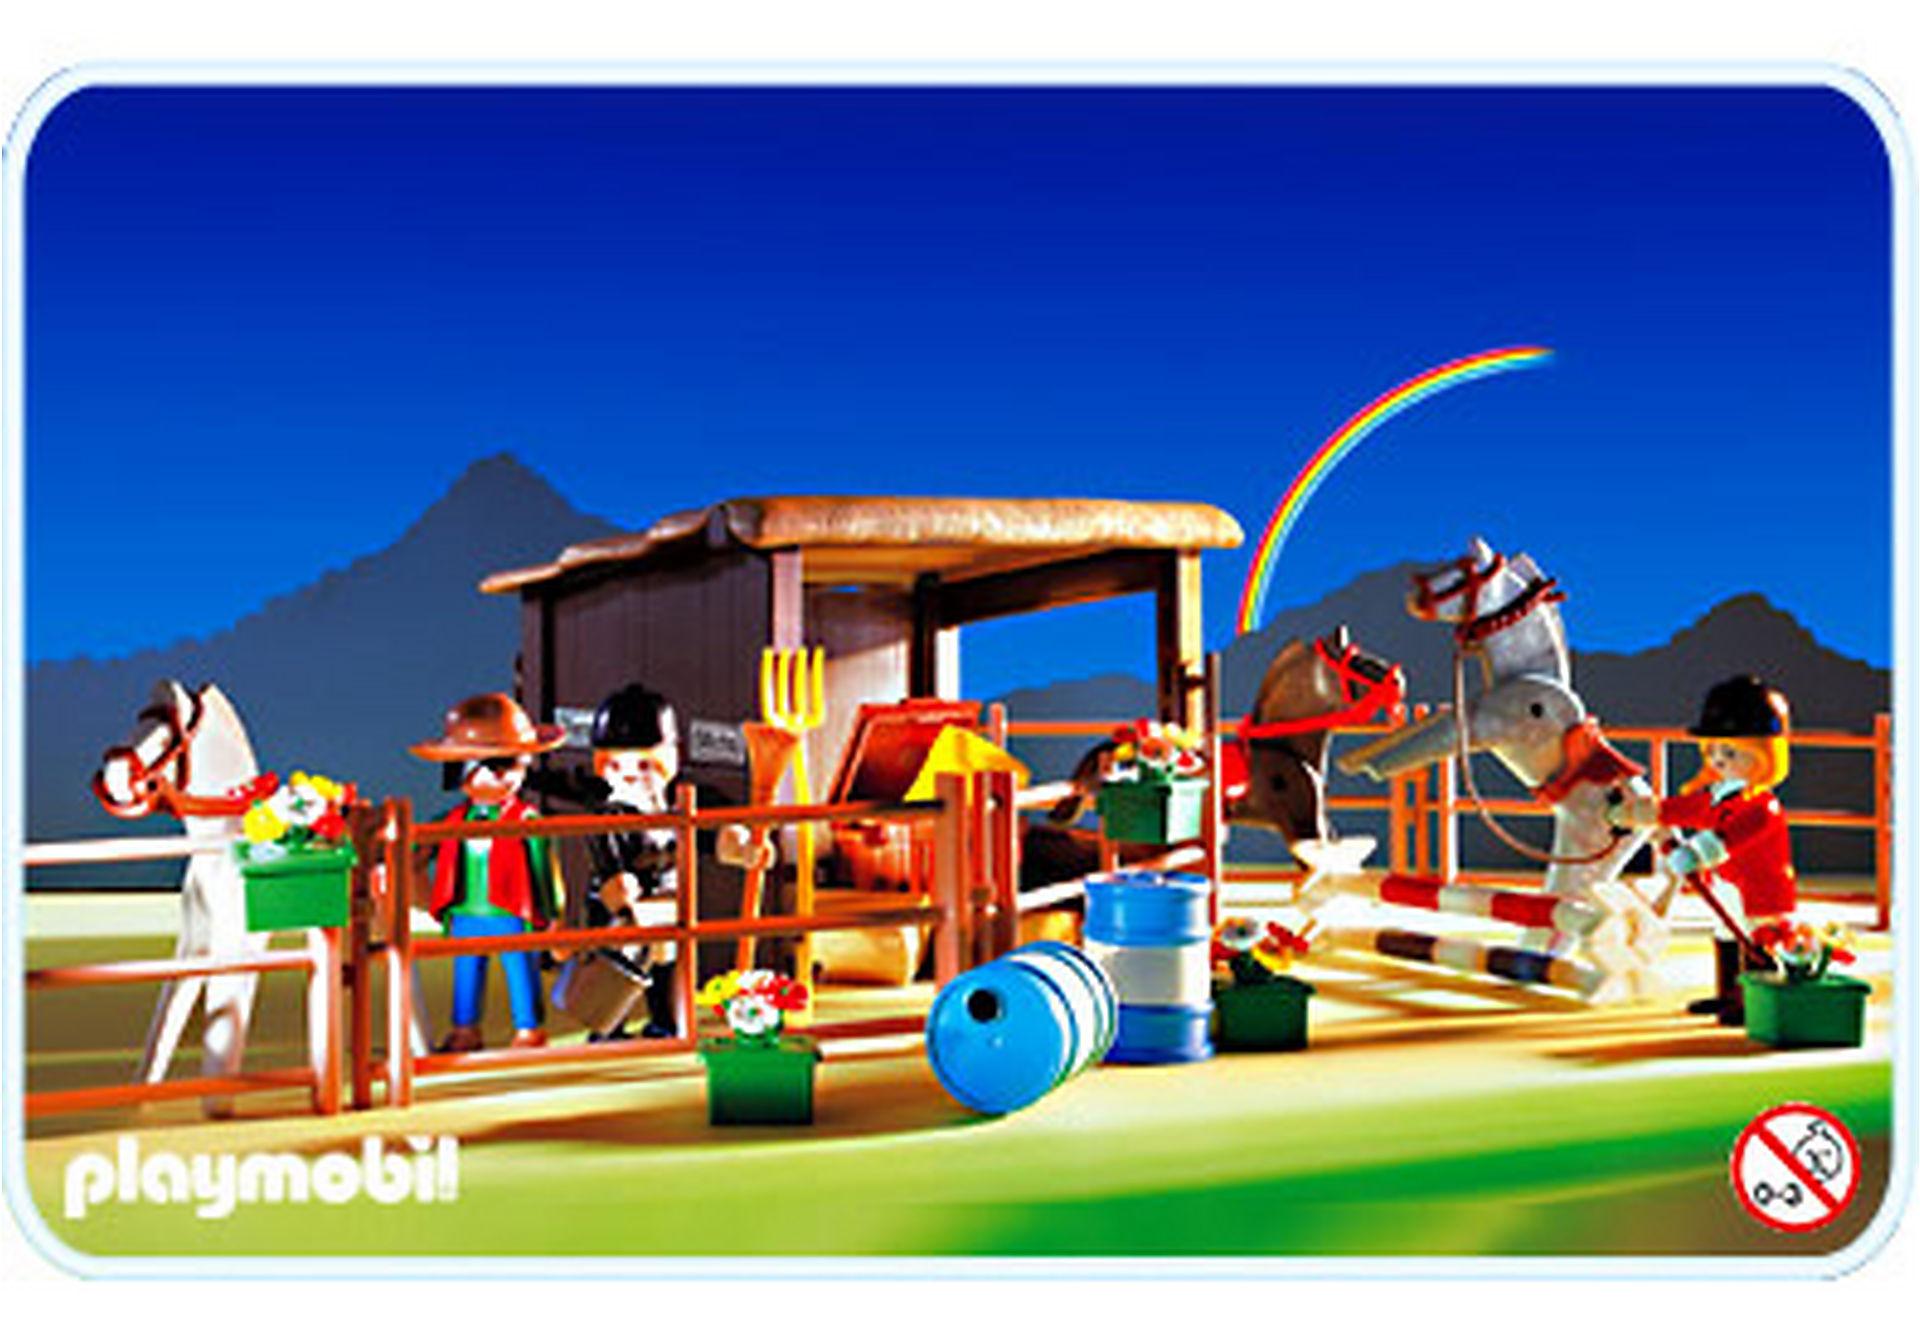 http://media.playmobil.com/i/playmobil/3855-A_product_detail/Reitplatz / Unterstand